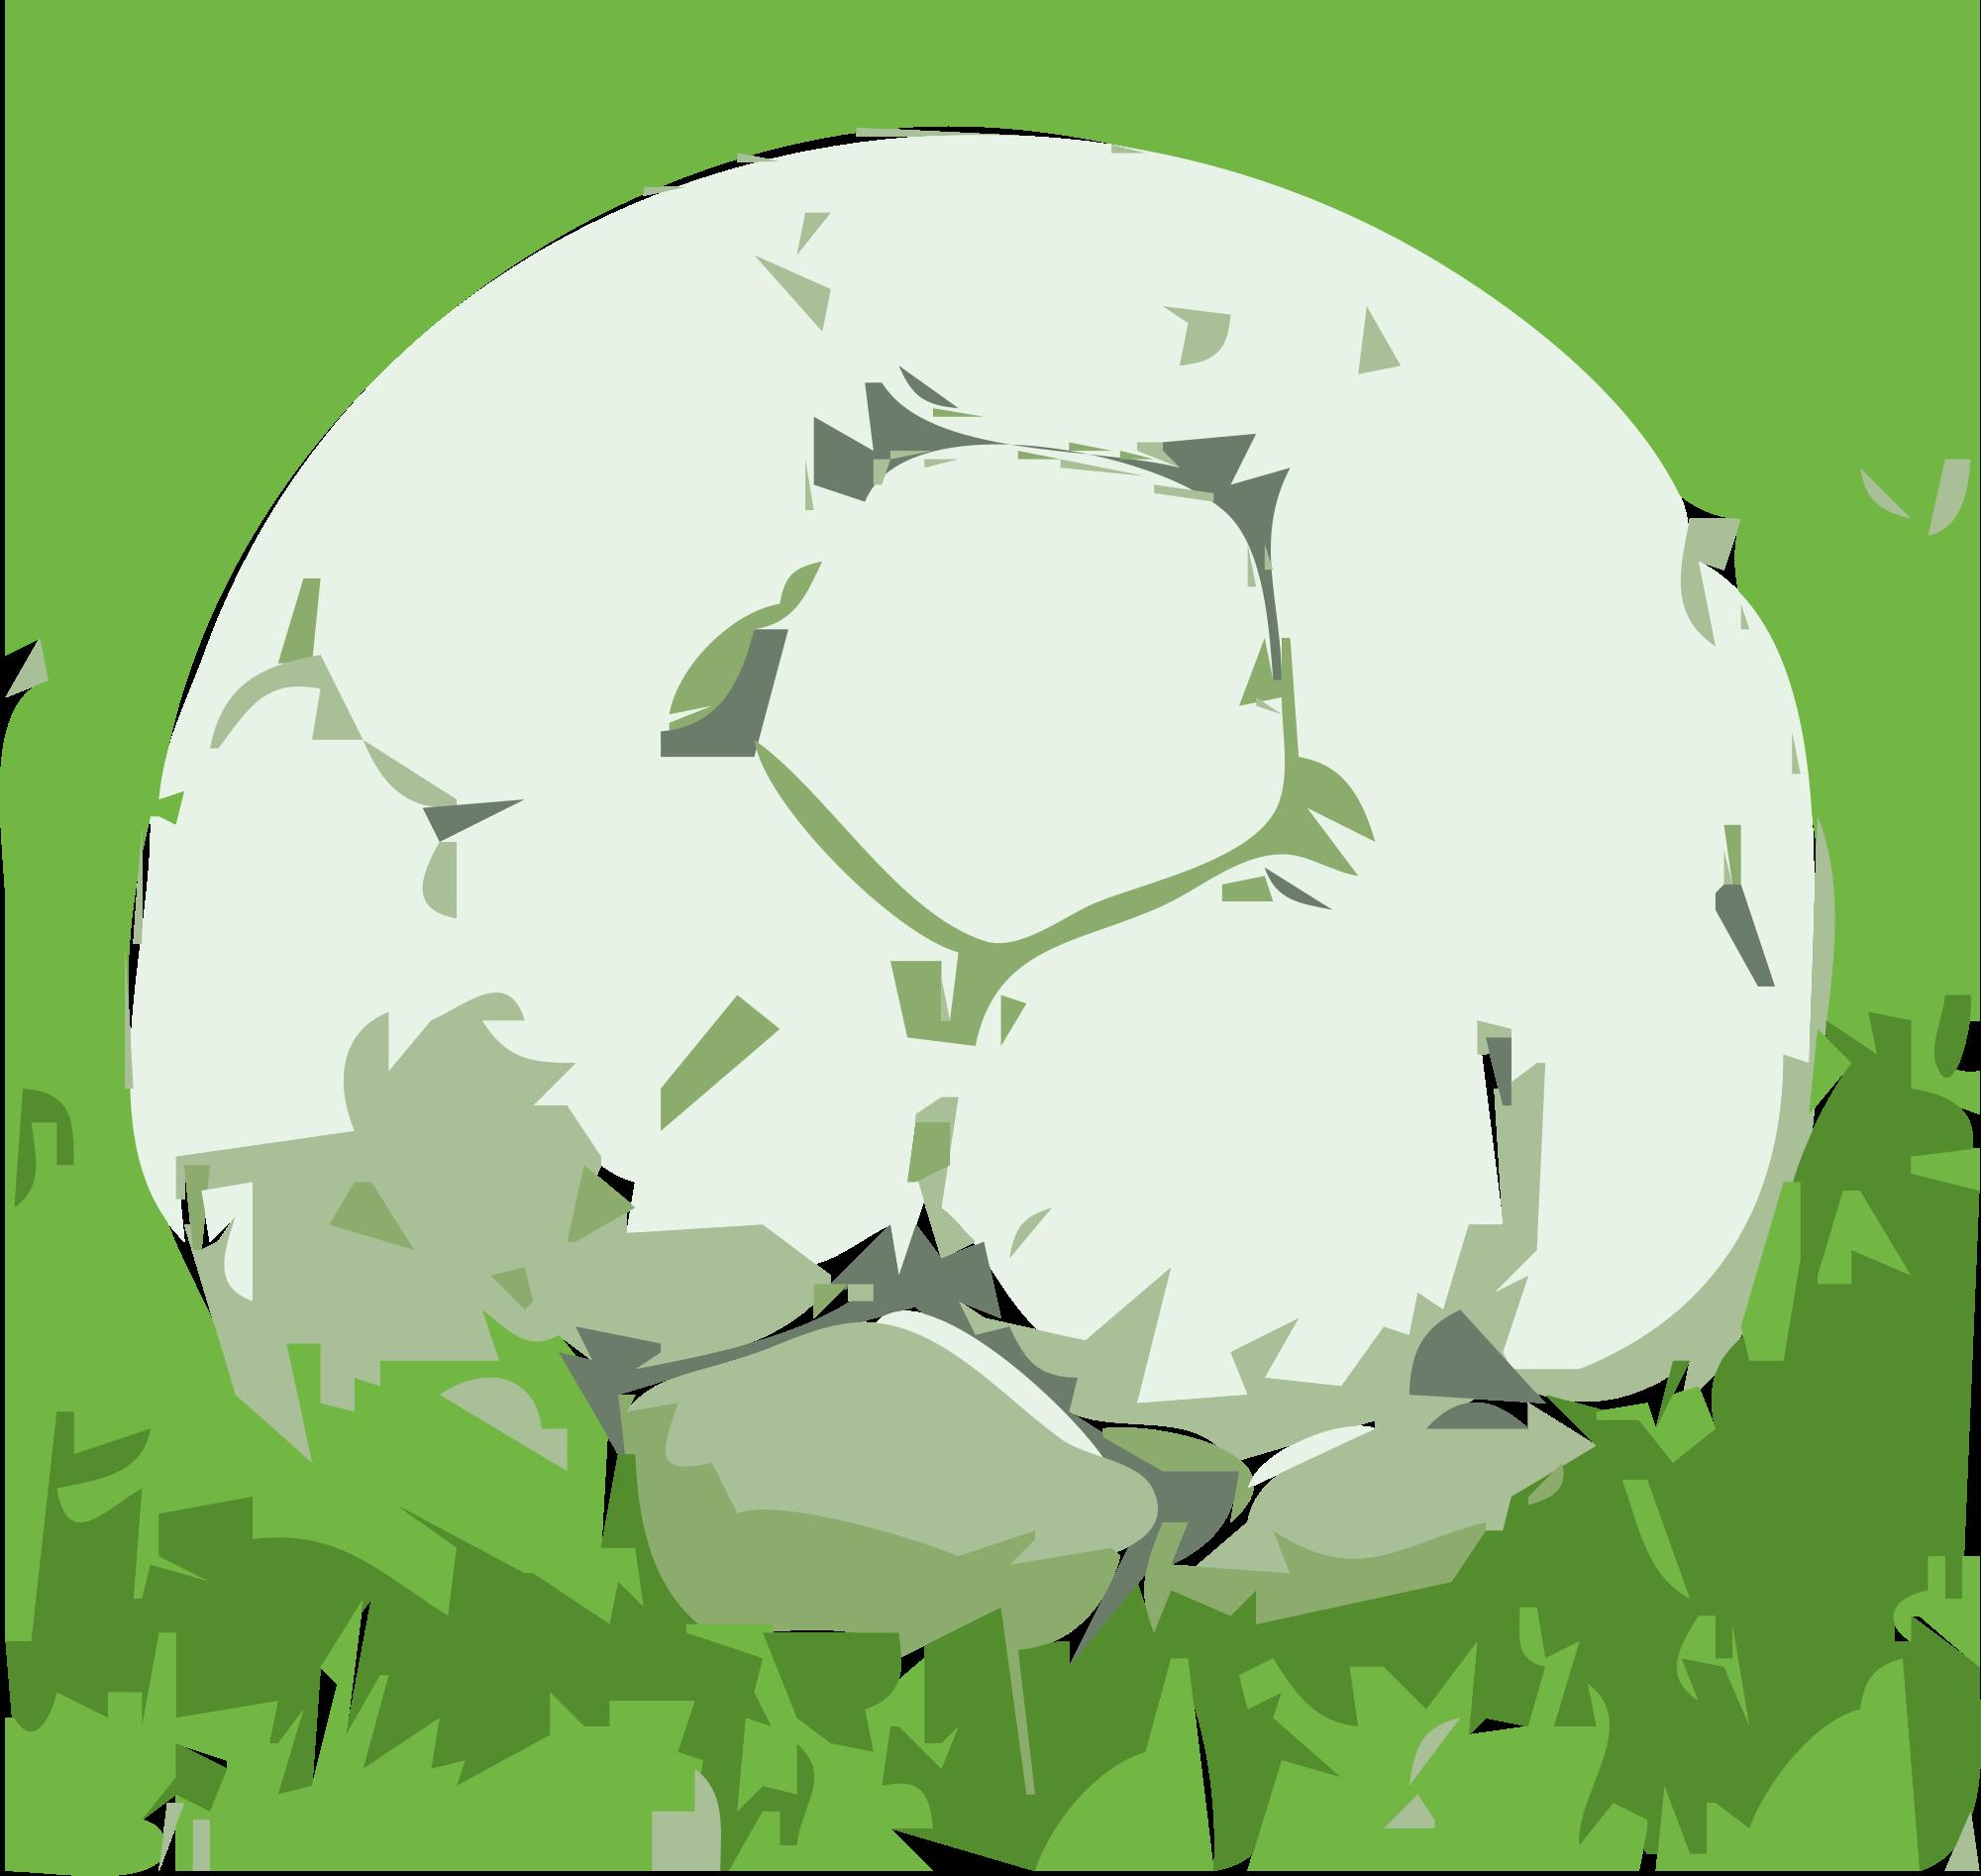 Free clip art grass clipart image 2 2